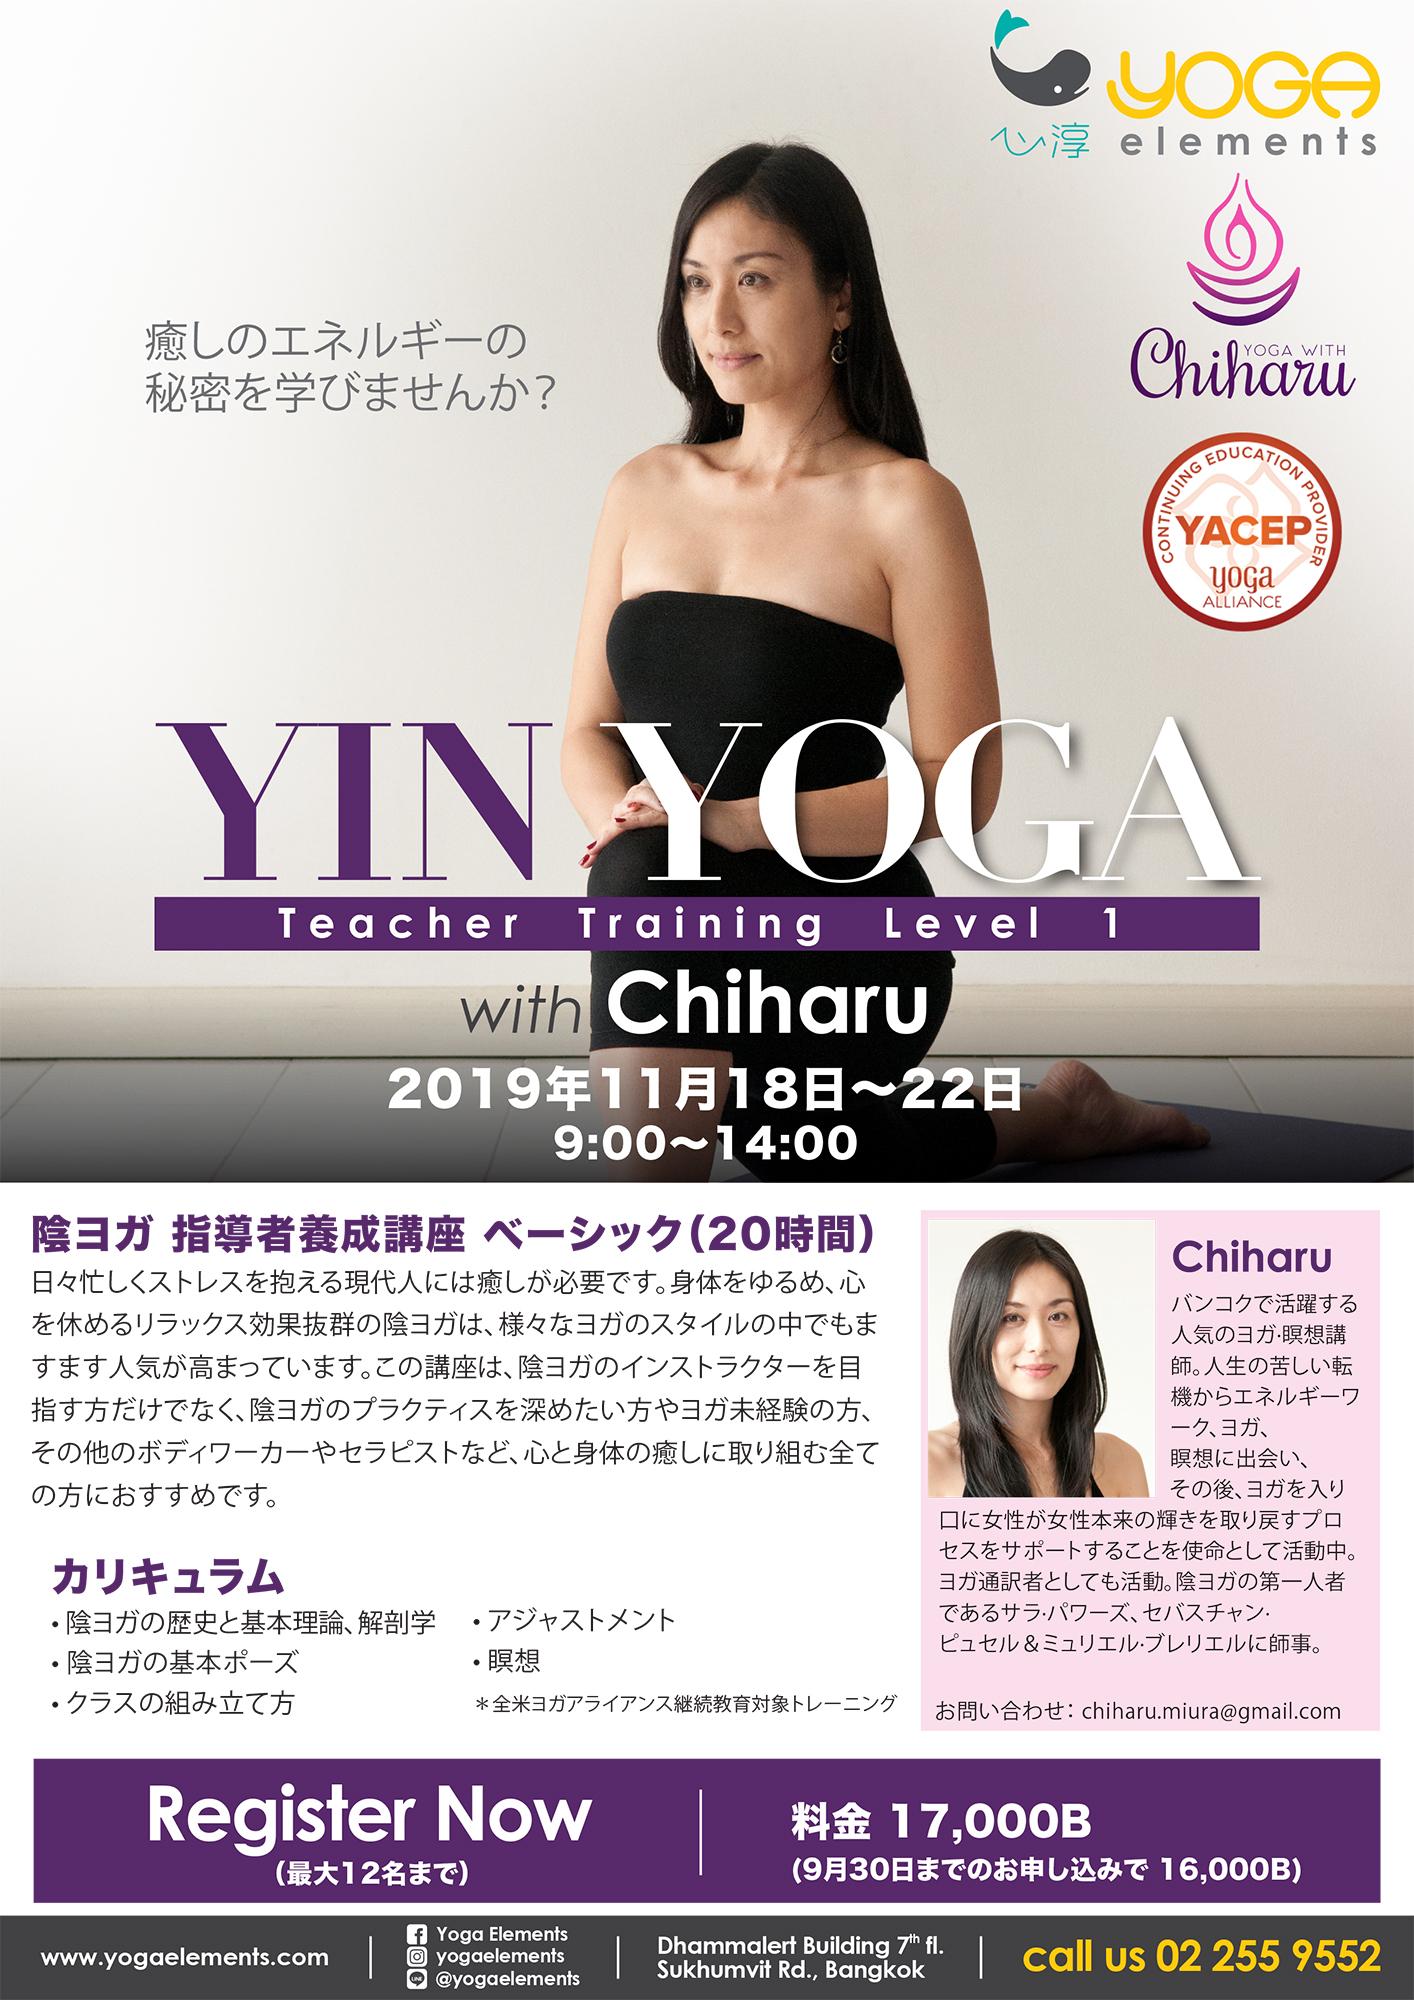 190706 Yin TT Chiharu module 1 S Ed.jpg